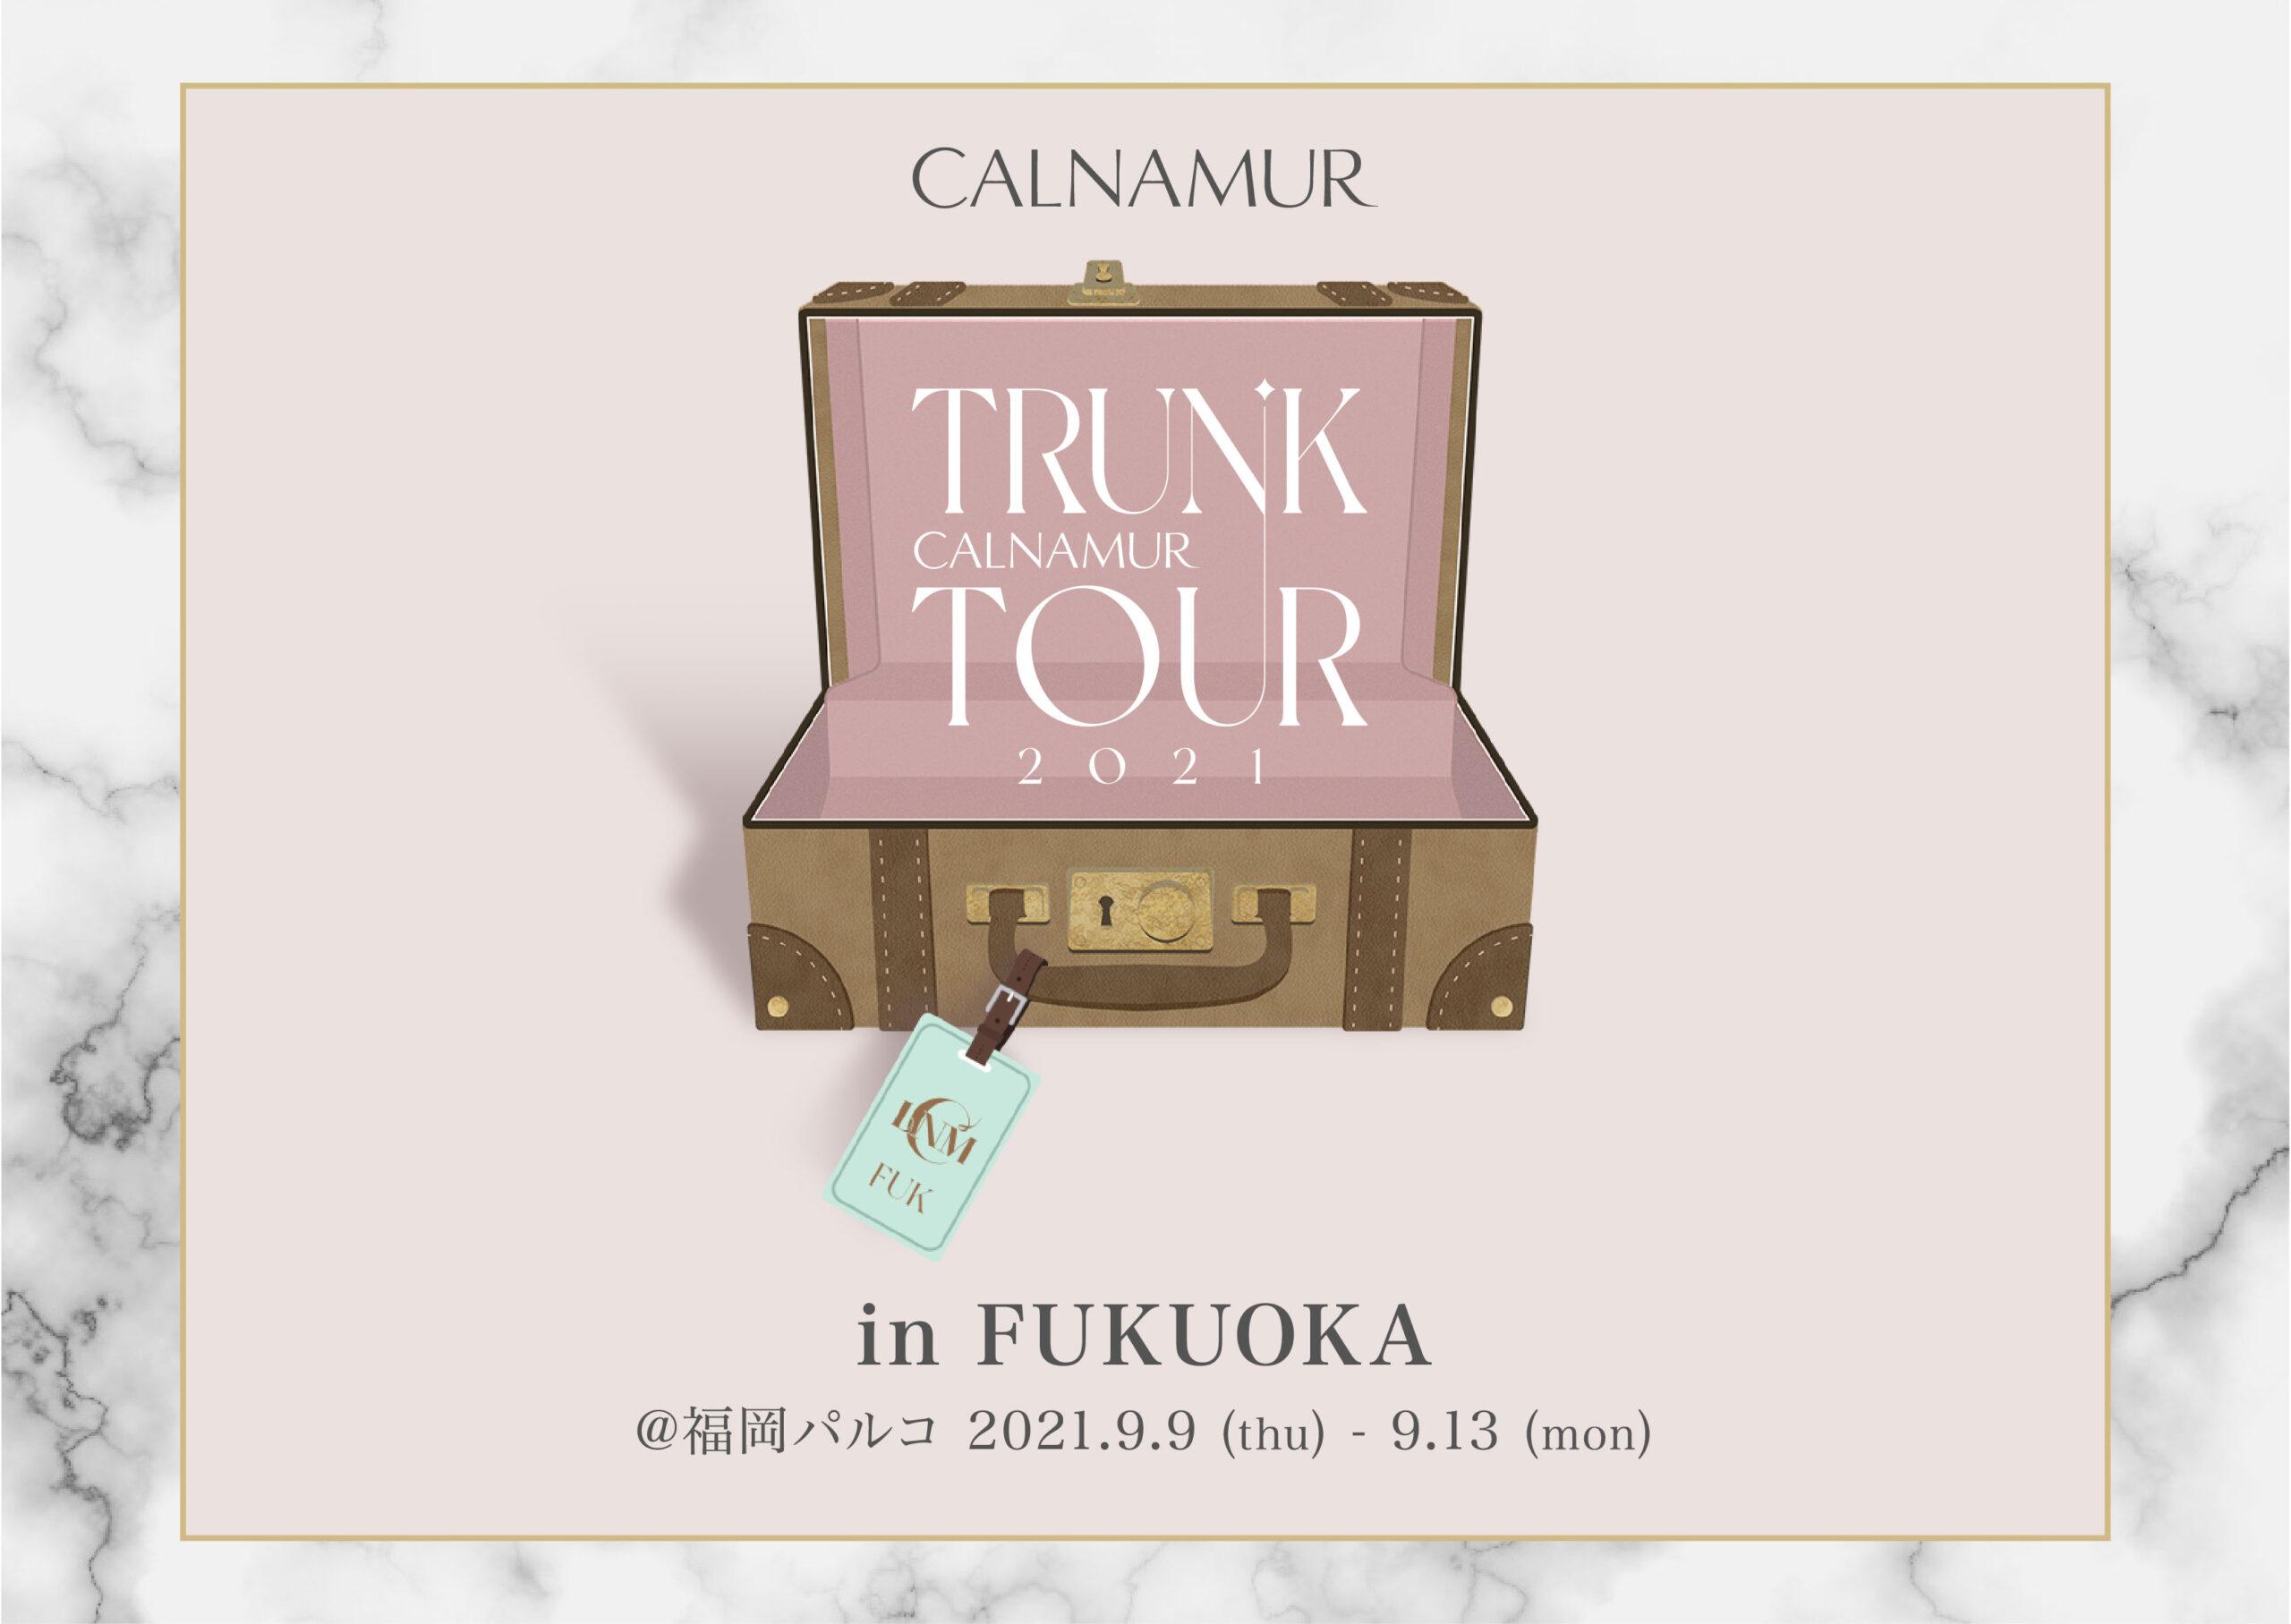 09.11(sat)CALNAMUR TRUNK TOUR 2021 in FUKUOKA来店イベント入店予約について